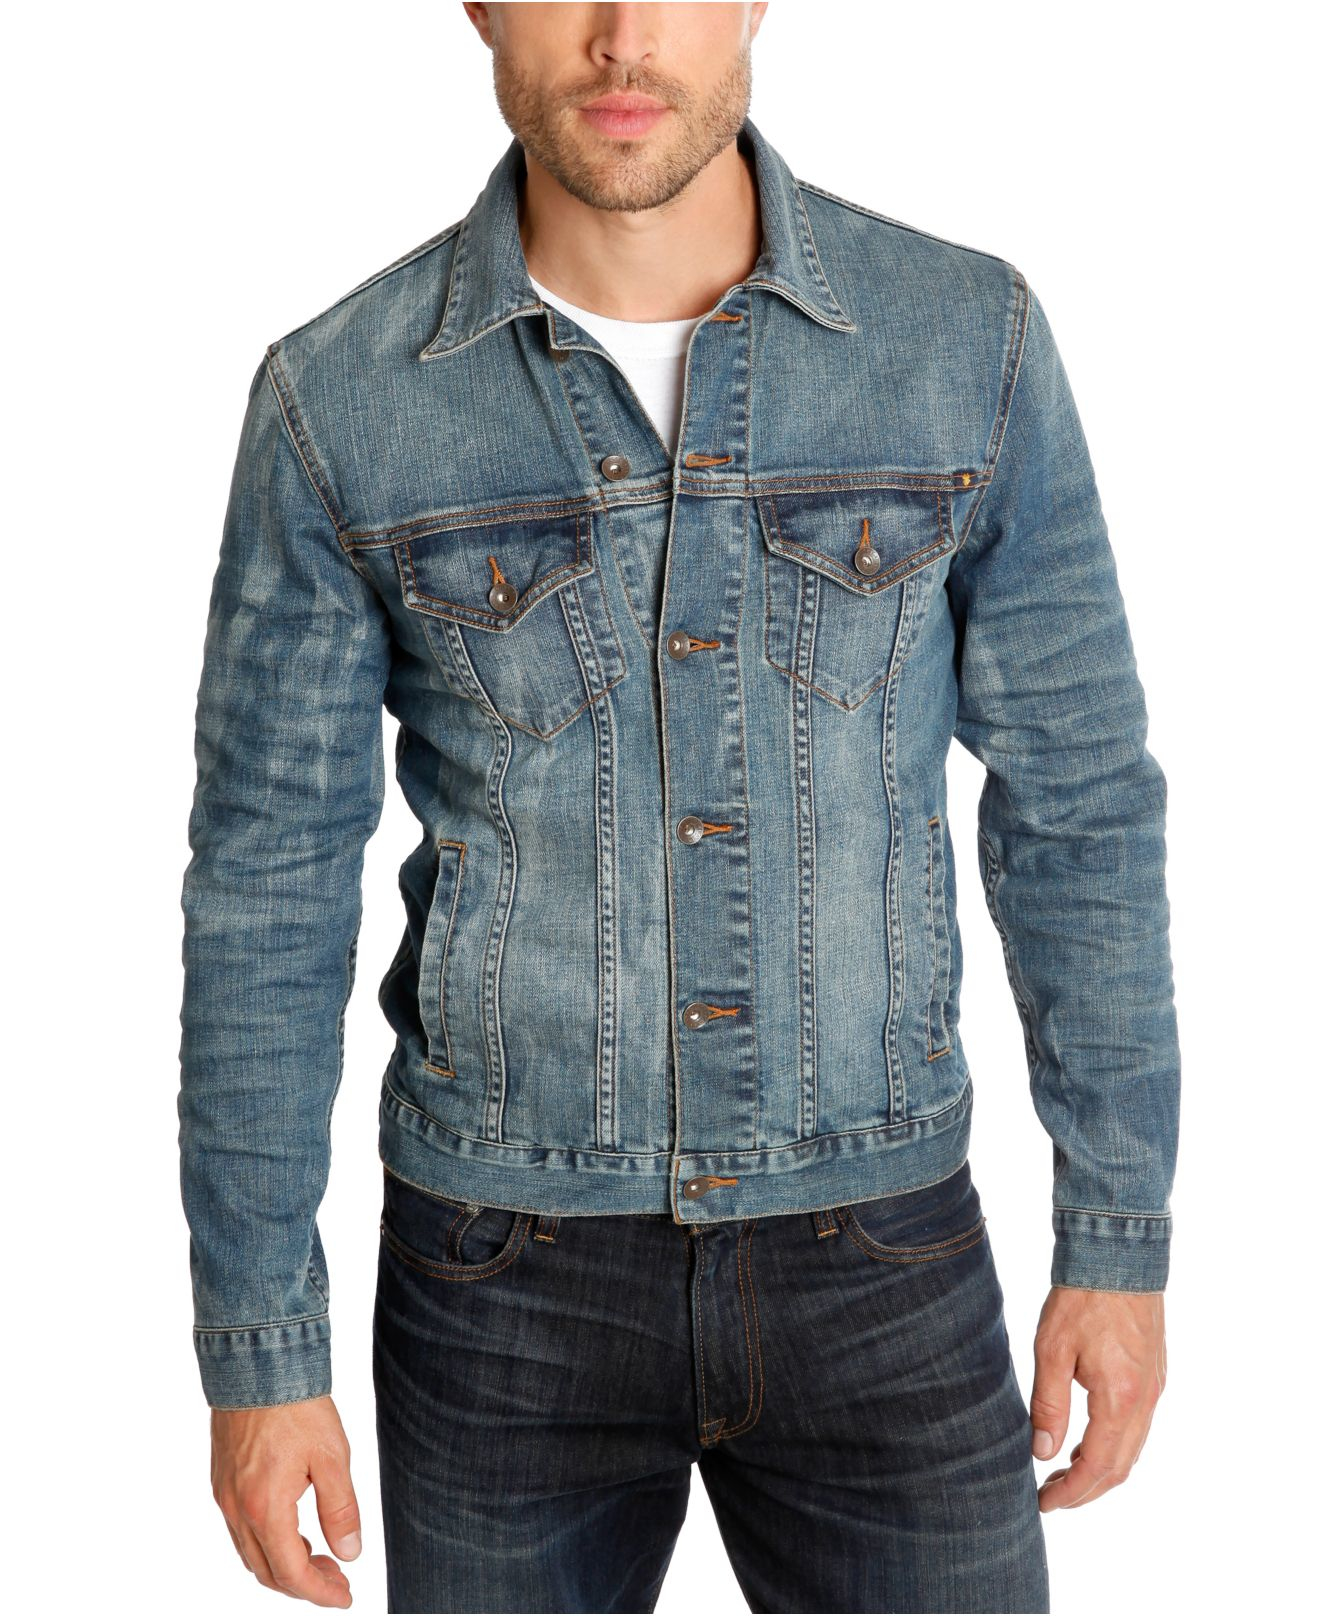 Mens Denim Blazers Jackets - Best Jacket 2017